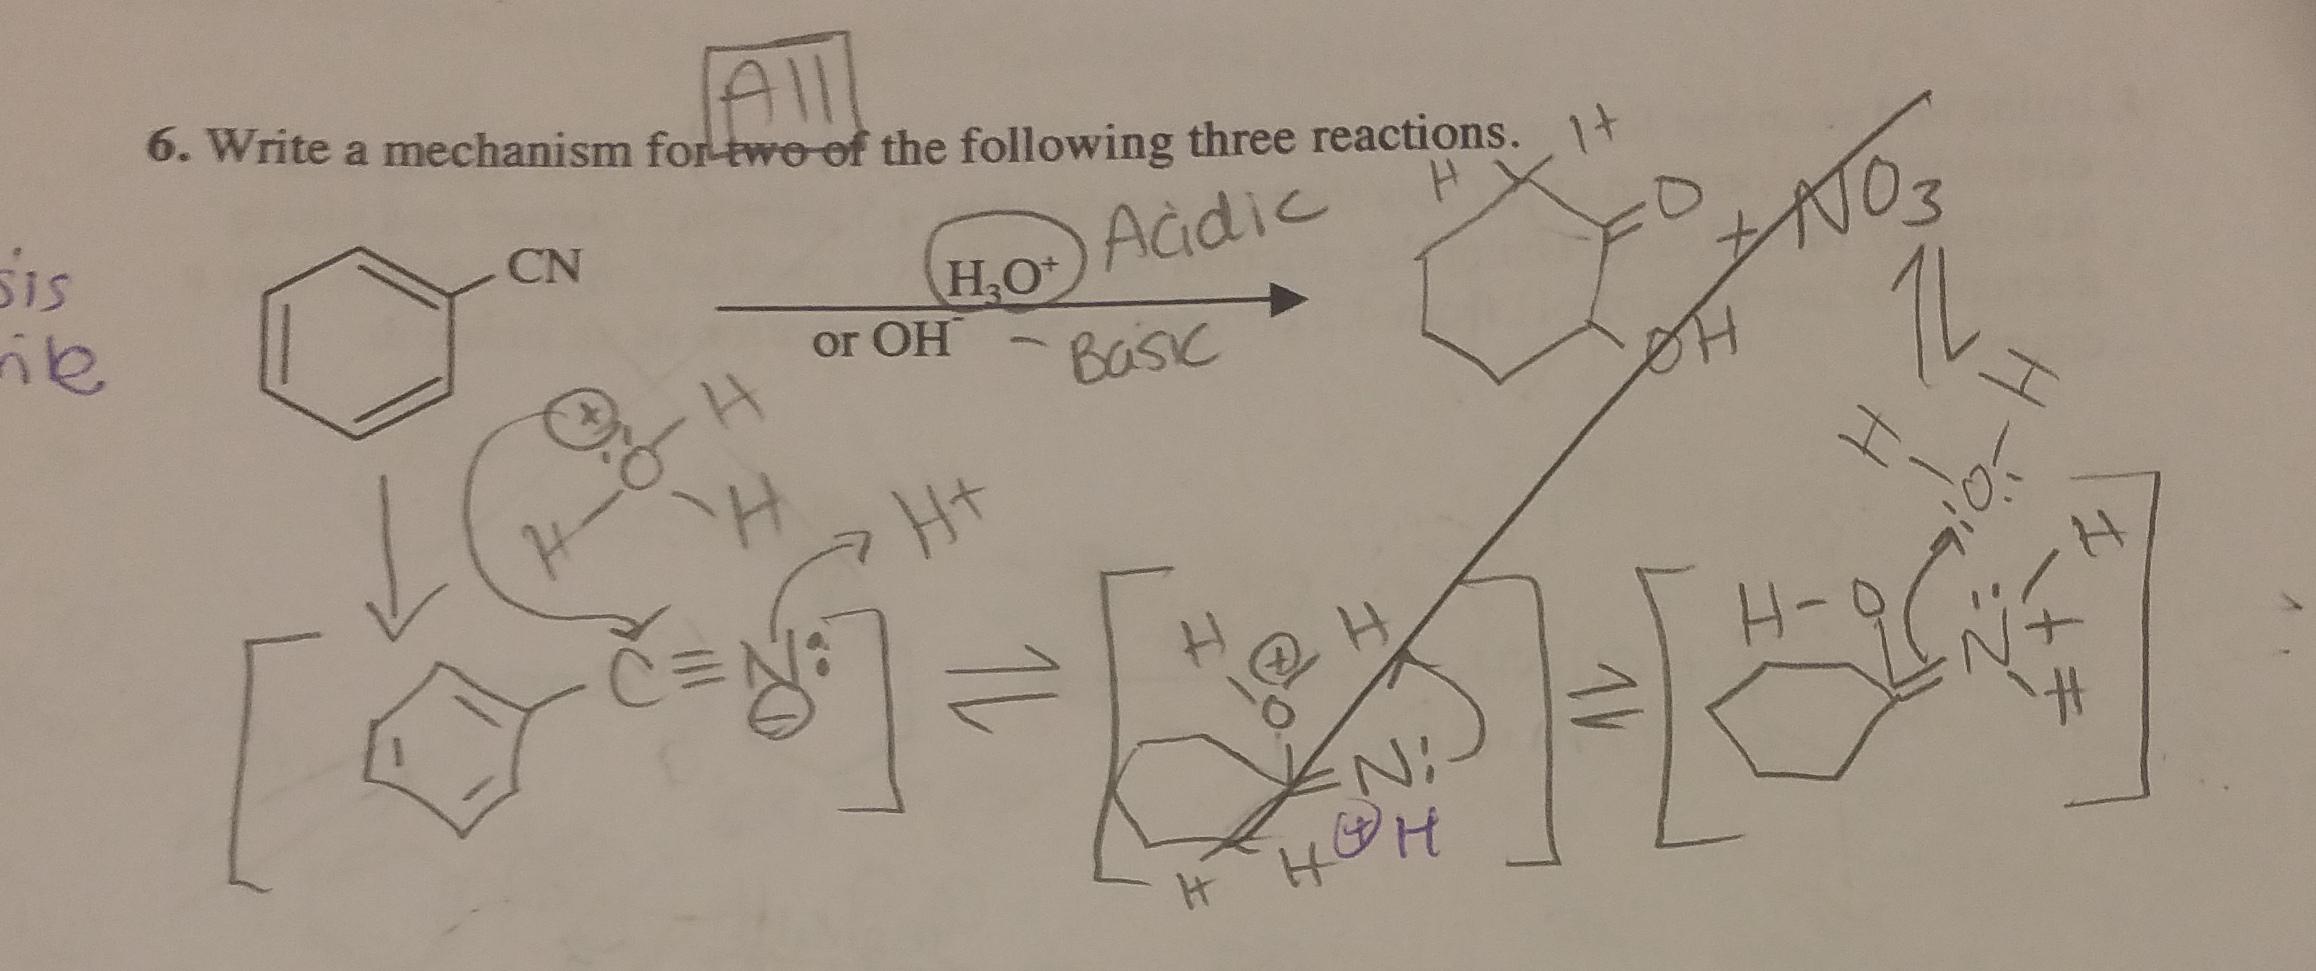 Solved: Acid/base Hydrolysis Of Nitrile  Please Show Both